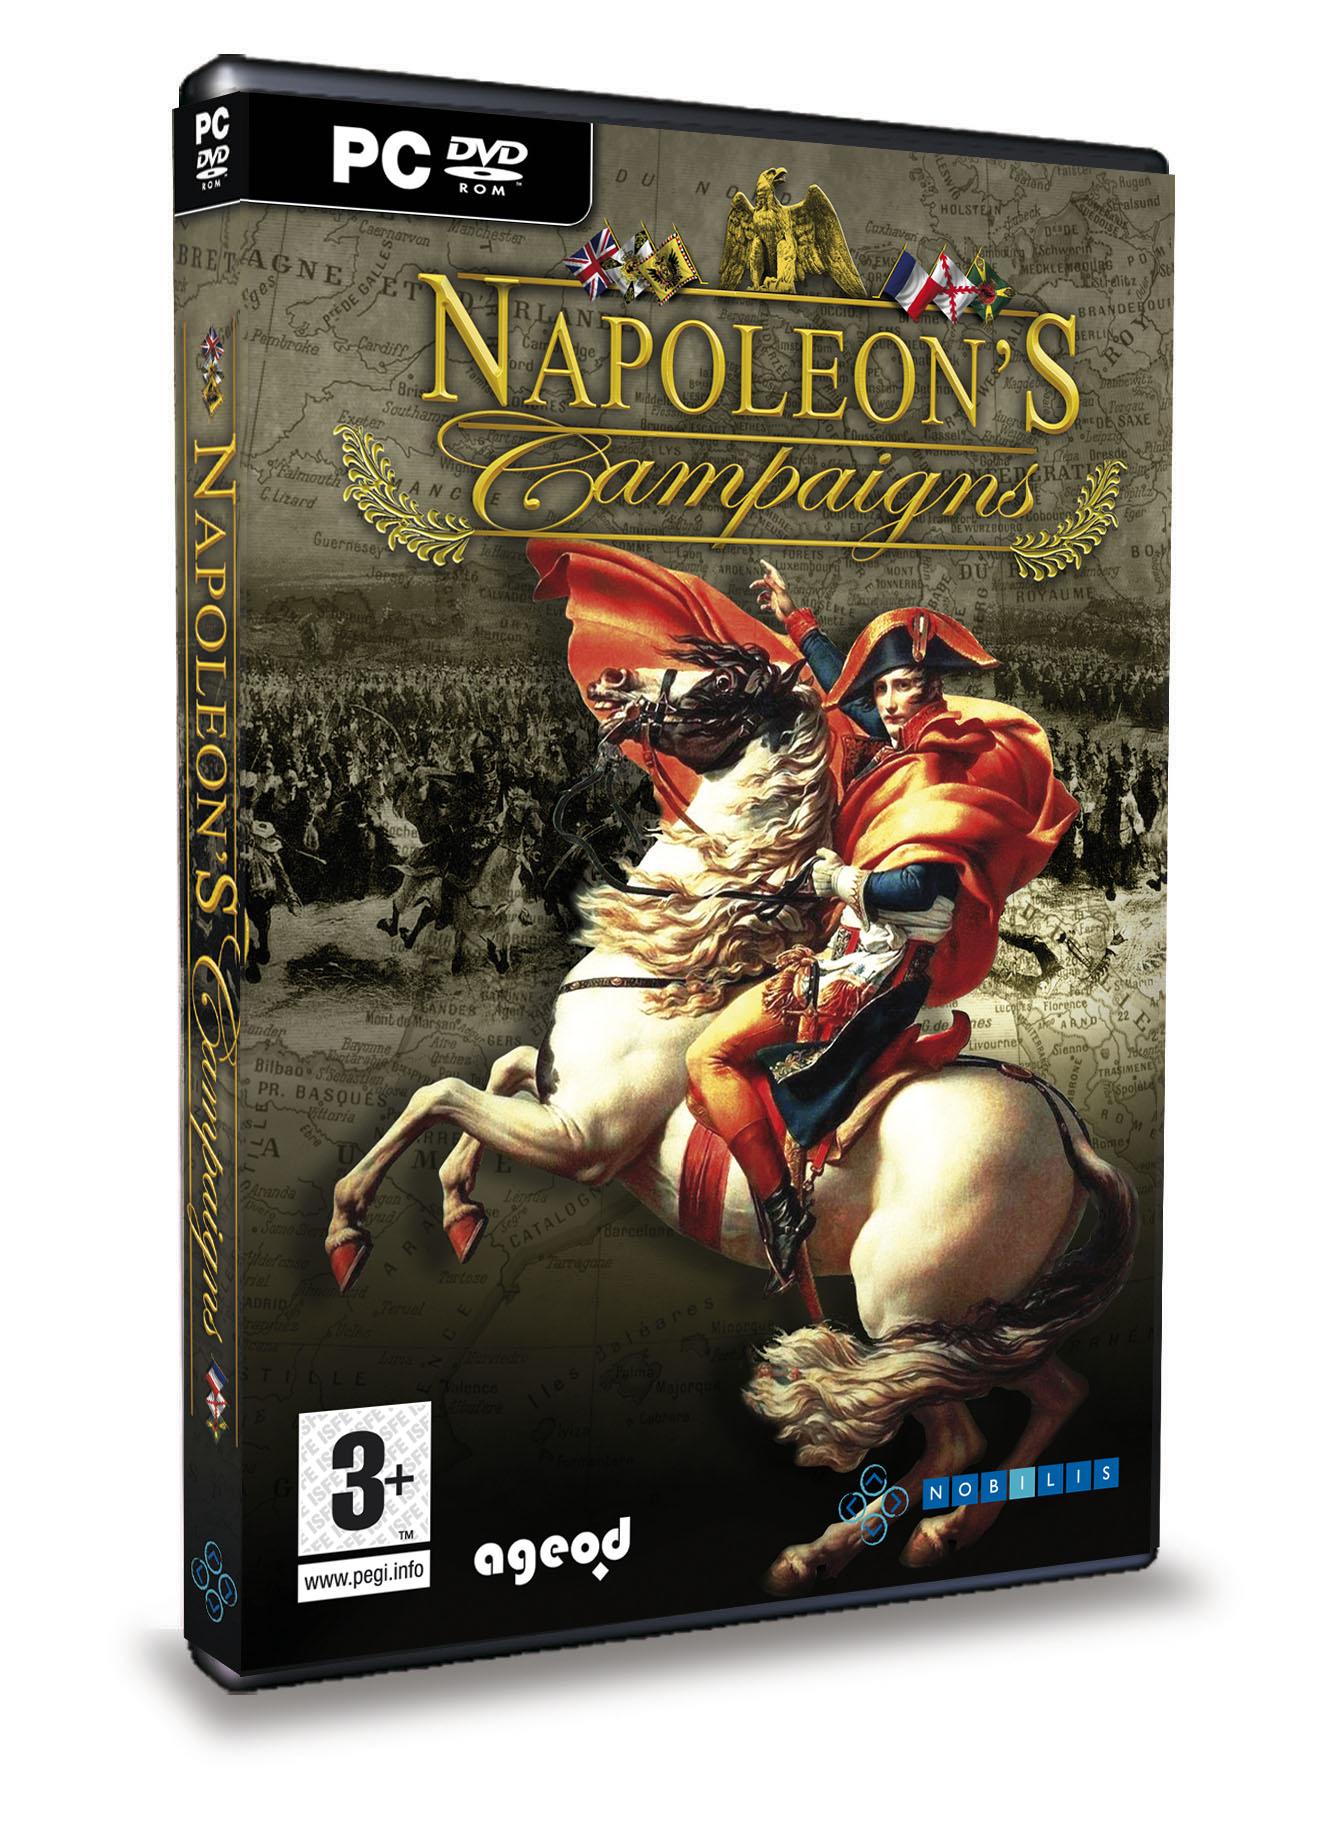 napoleons campaign